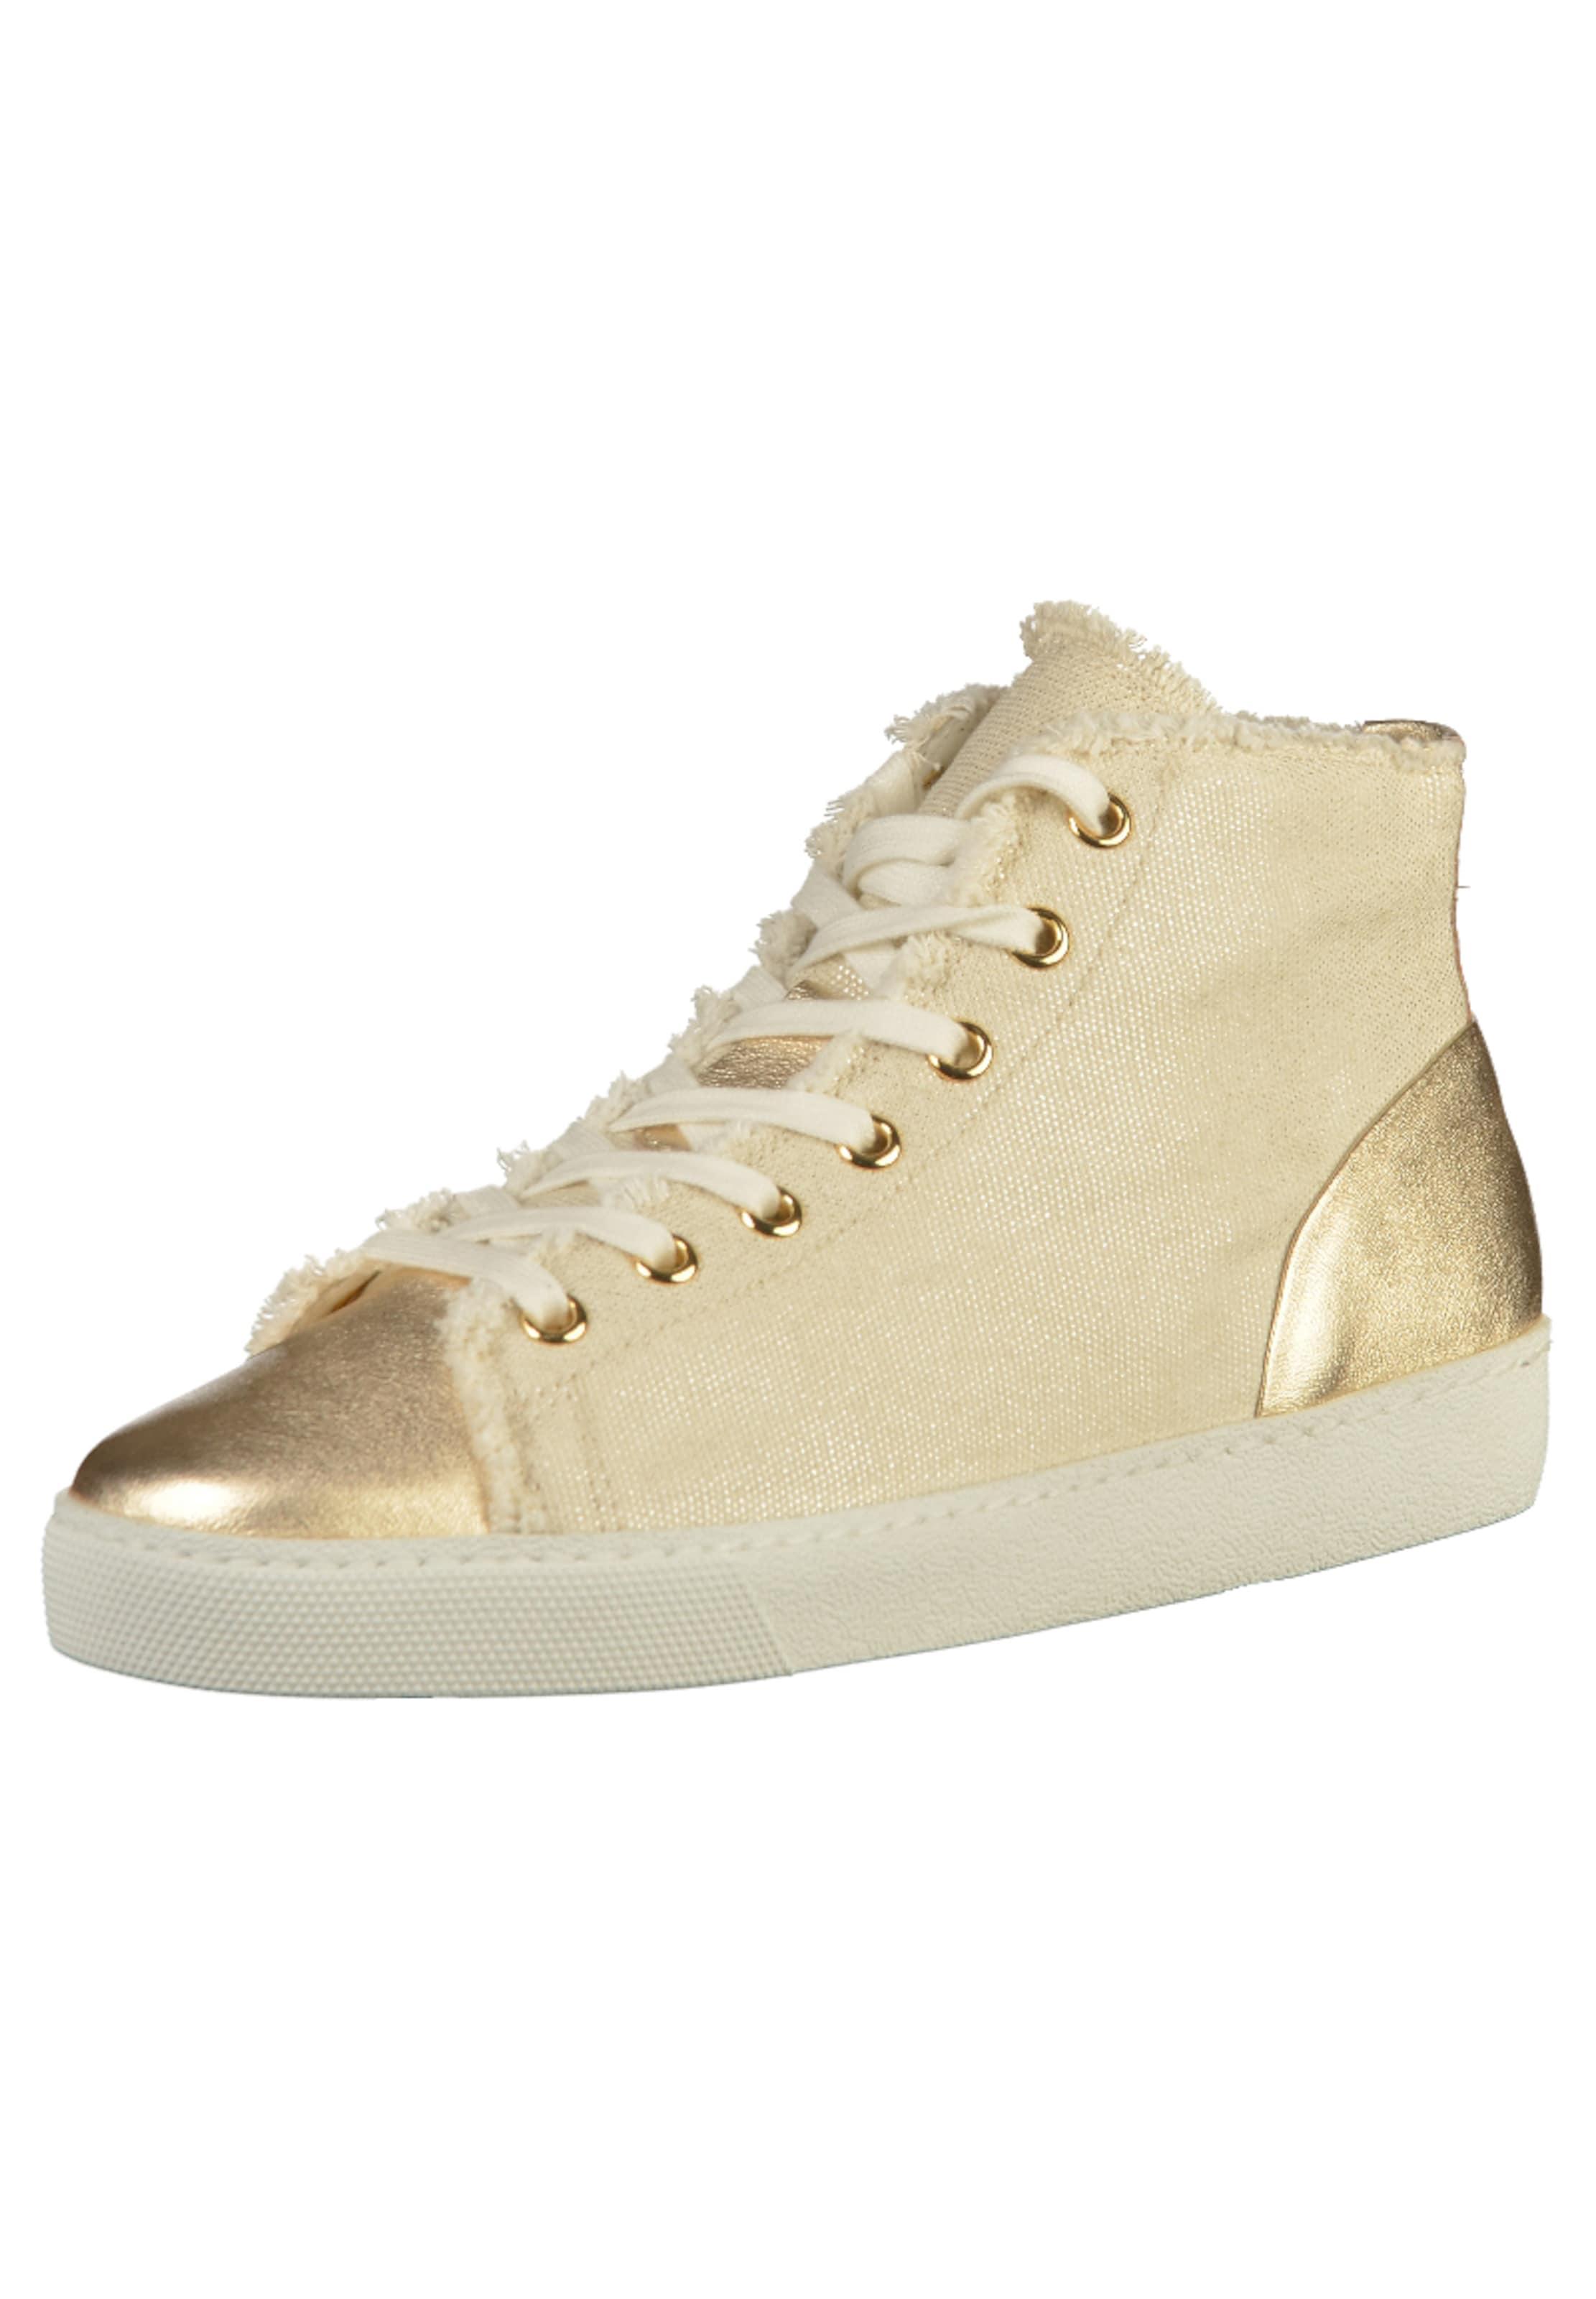 Högl Sneaker Günstige und langlebige Schuhe